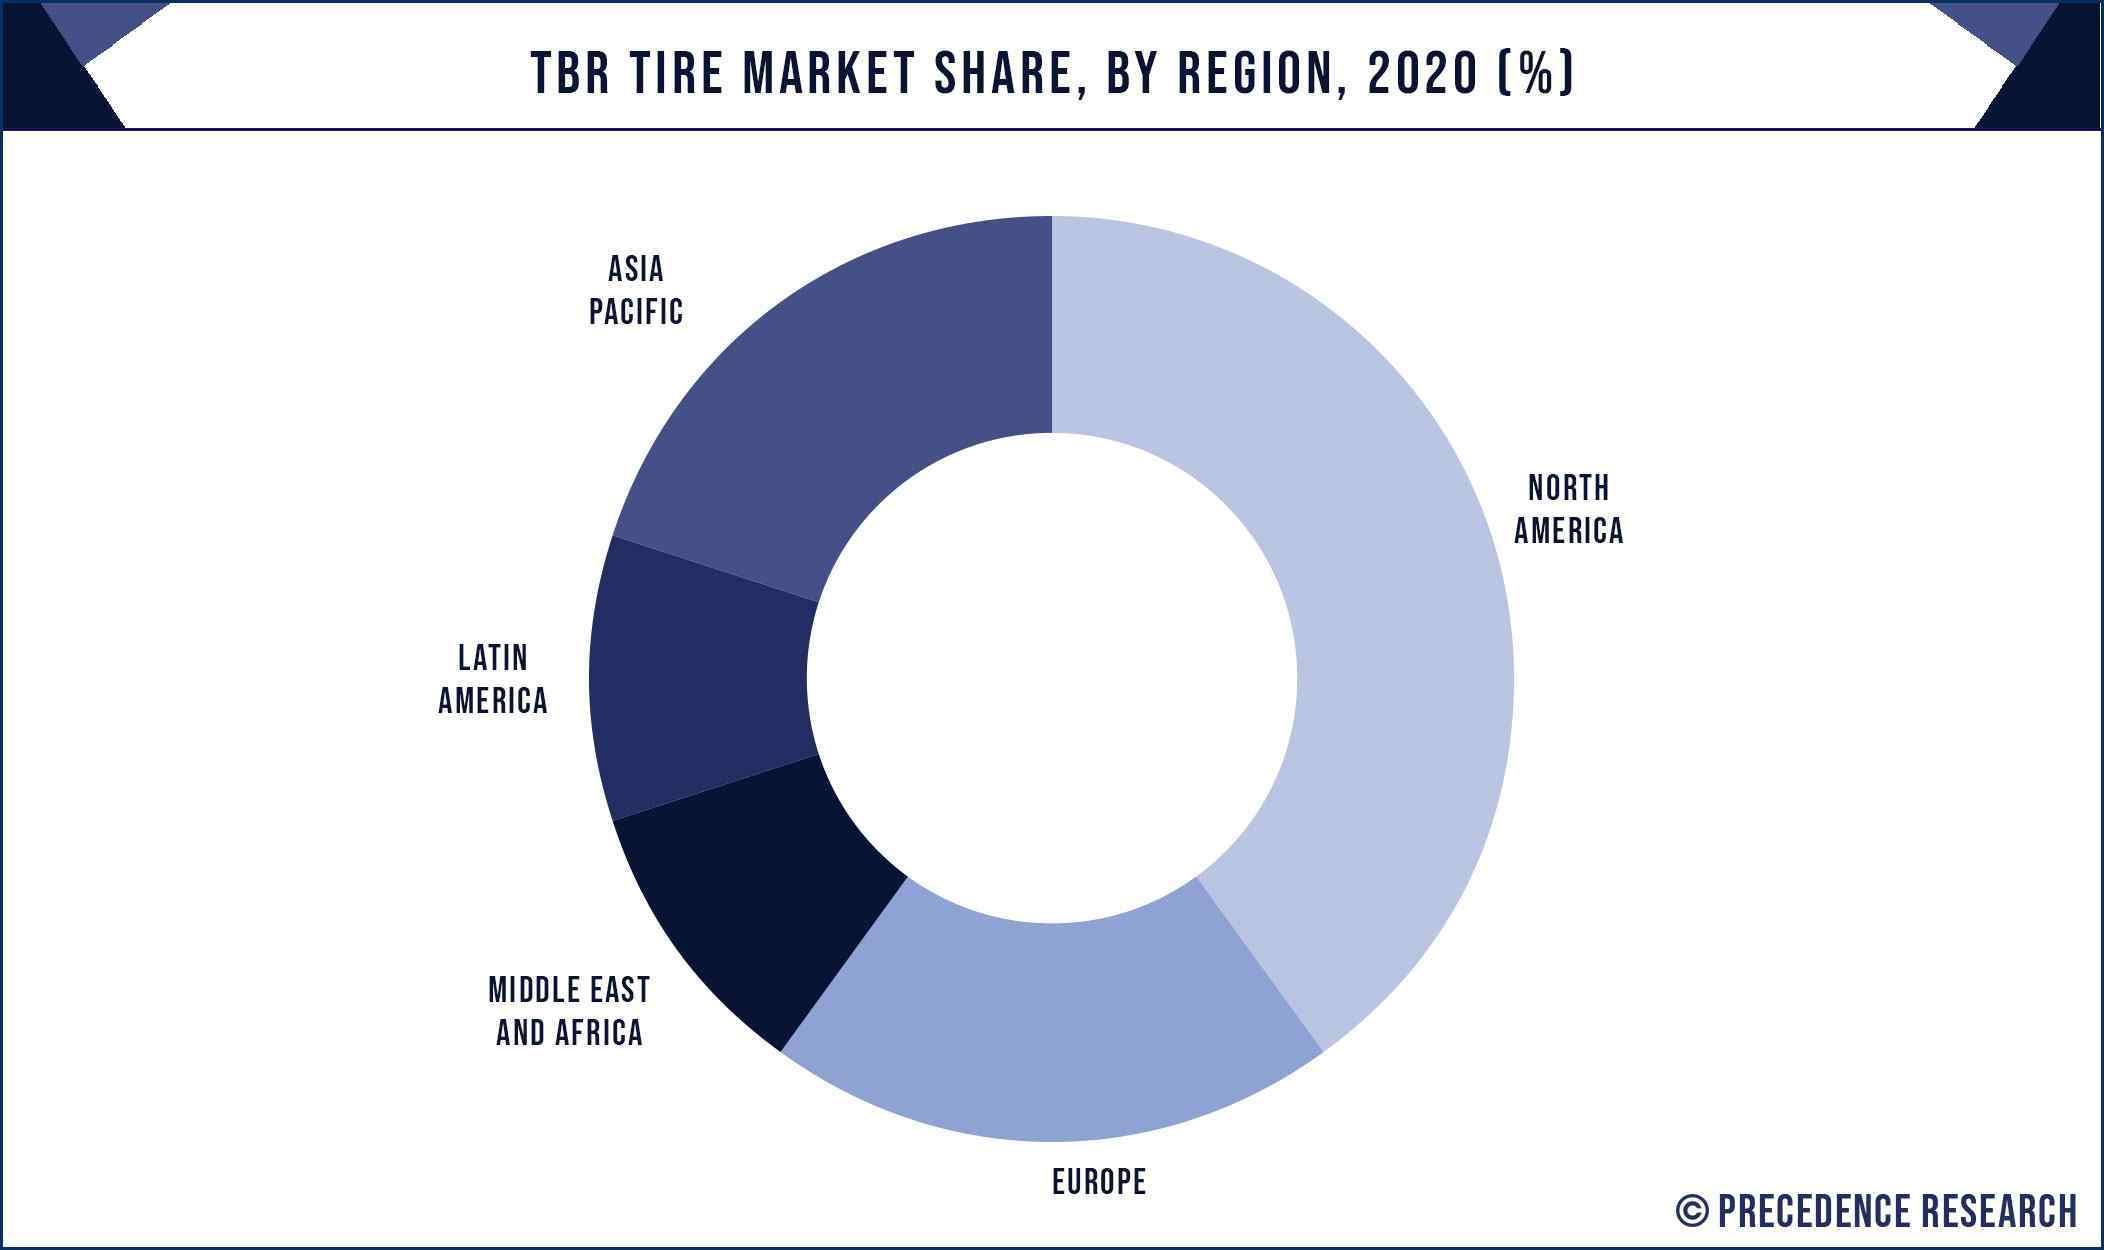 TBR Tire Market Share, By Region, 2020 (%)